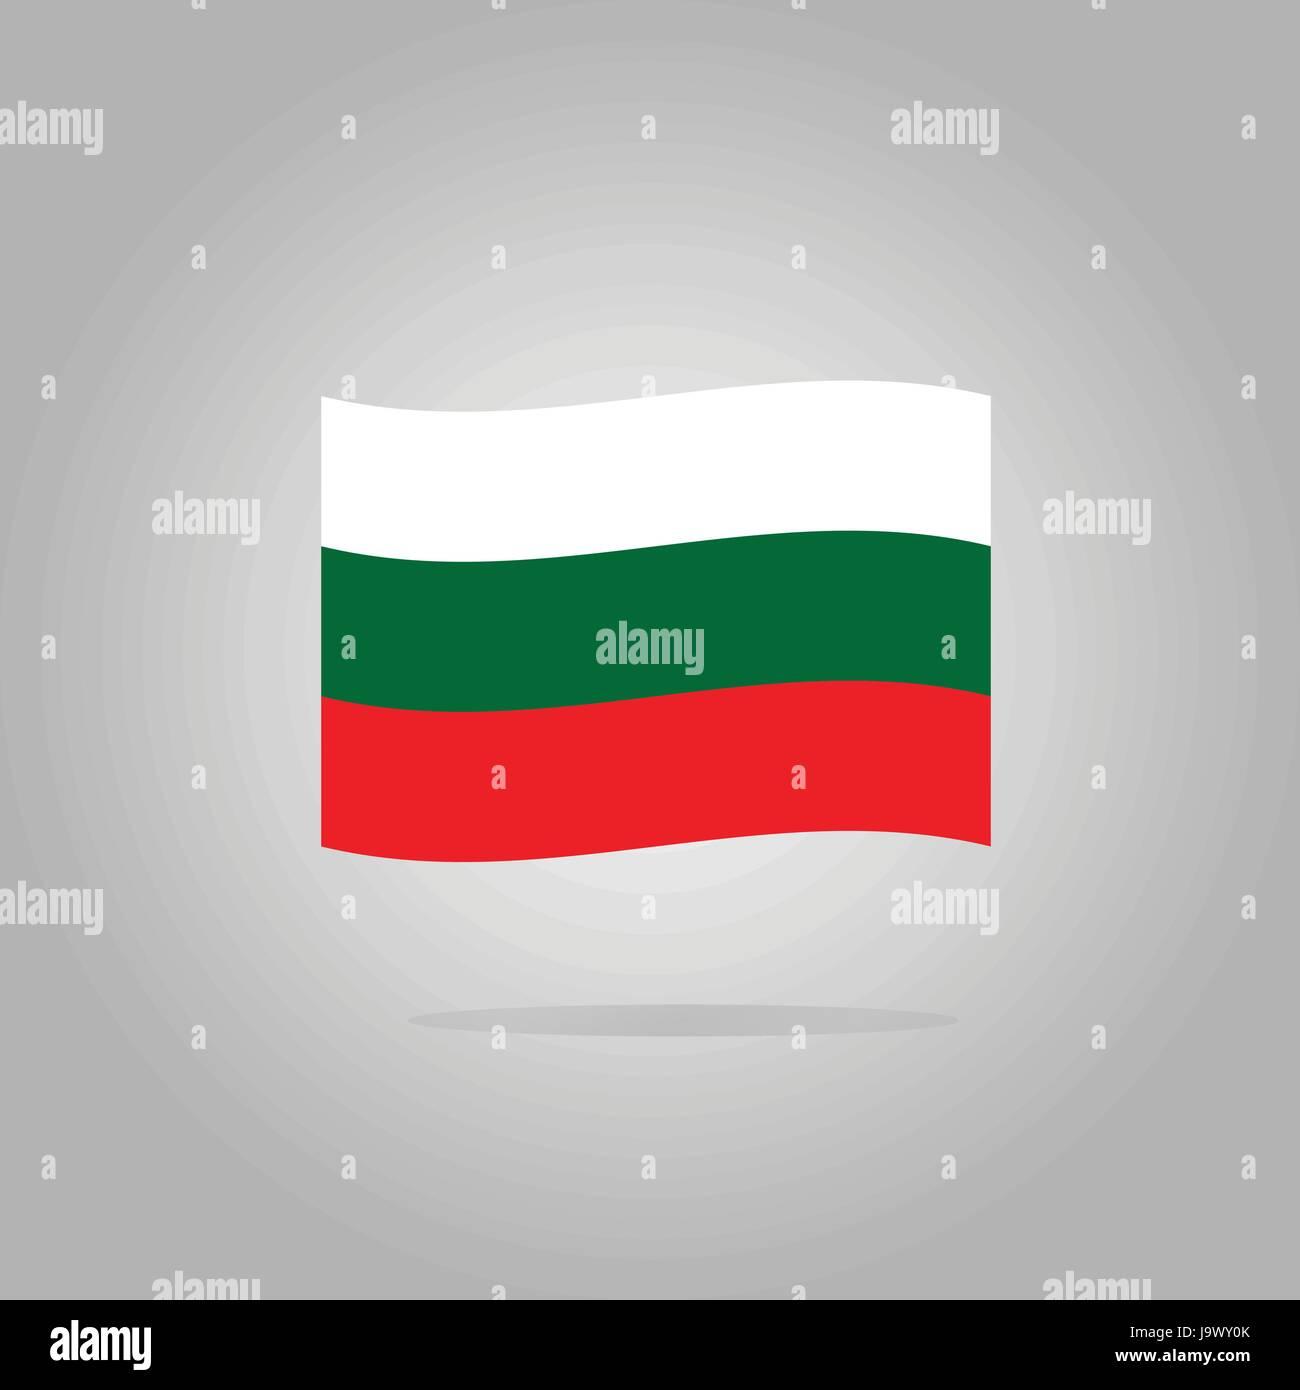 Bulgaria flag design illustration - Stock Image